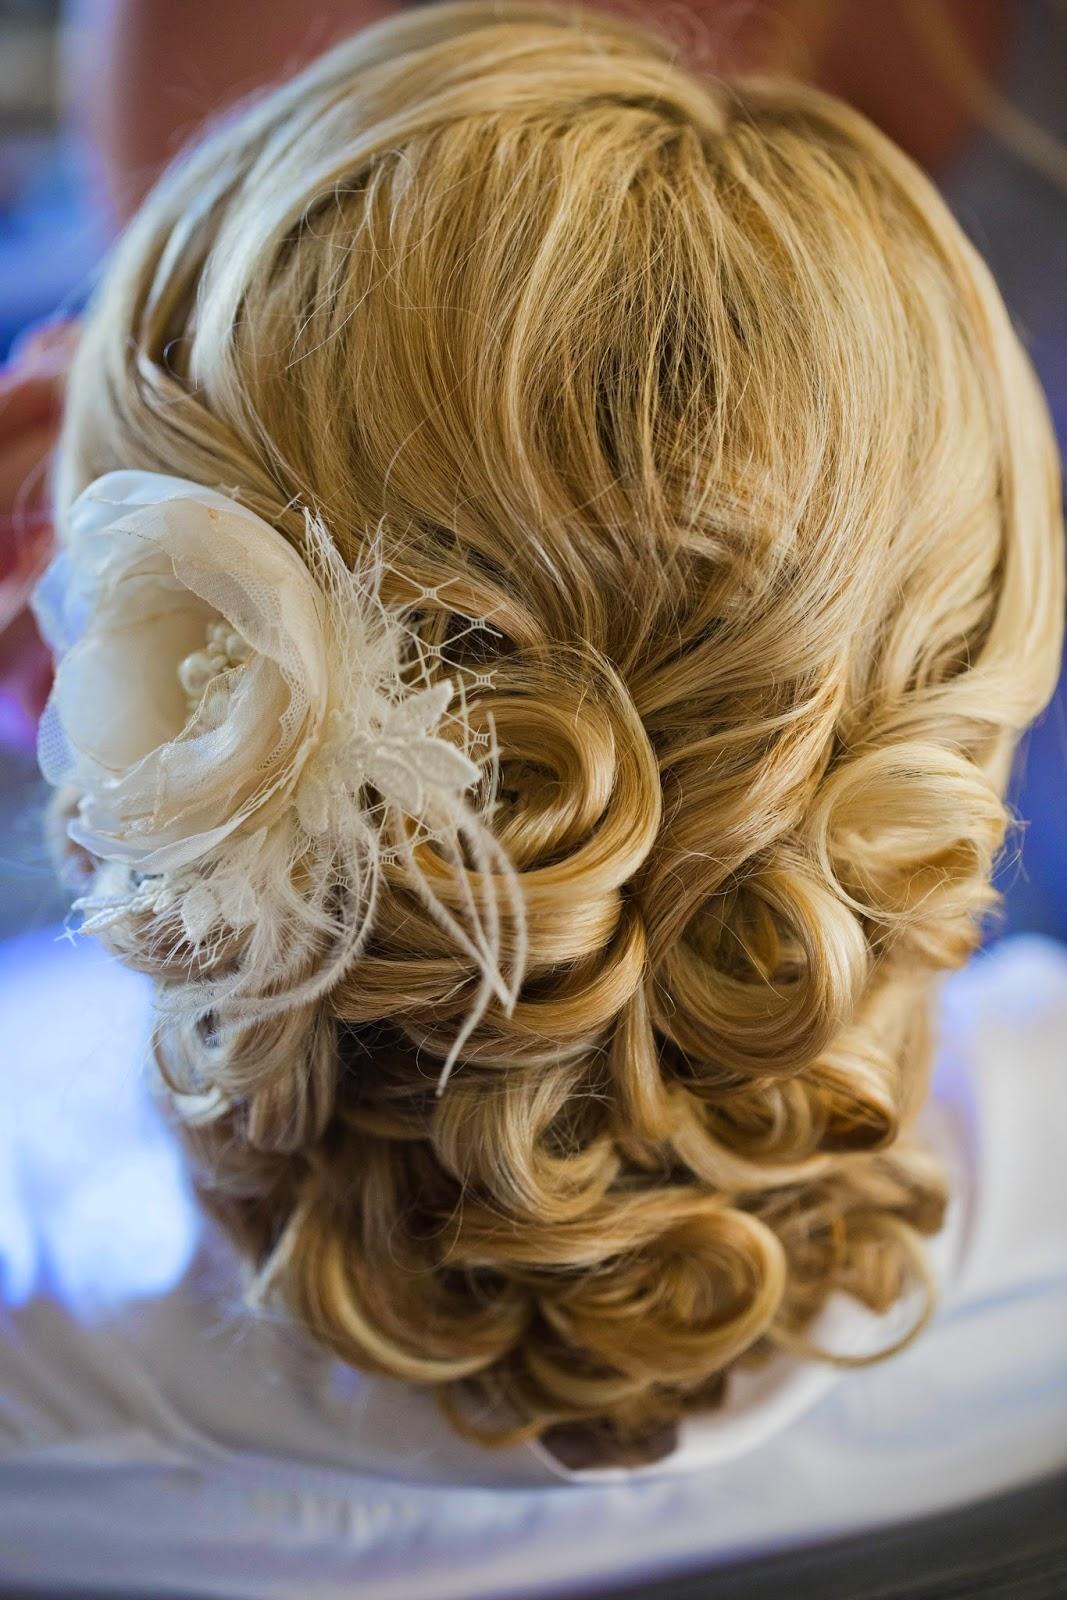 Sacramento wedding and bridal hair design by Christi Reynolds Beauty